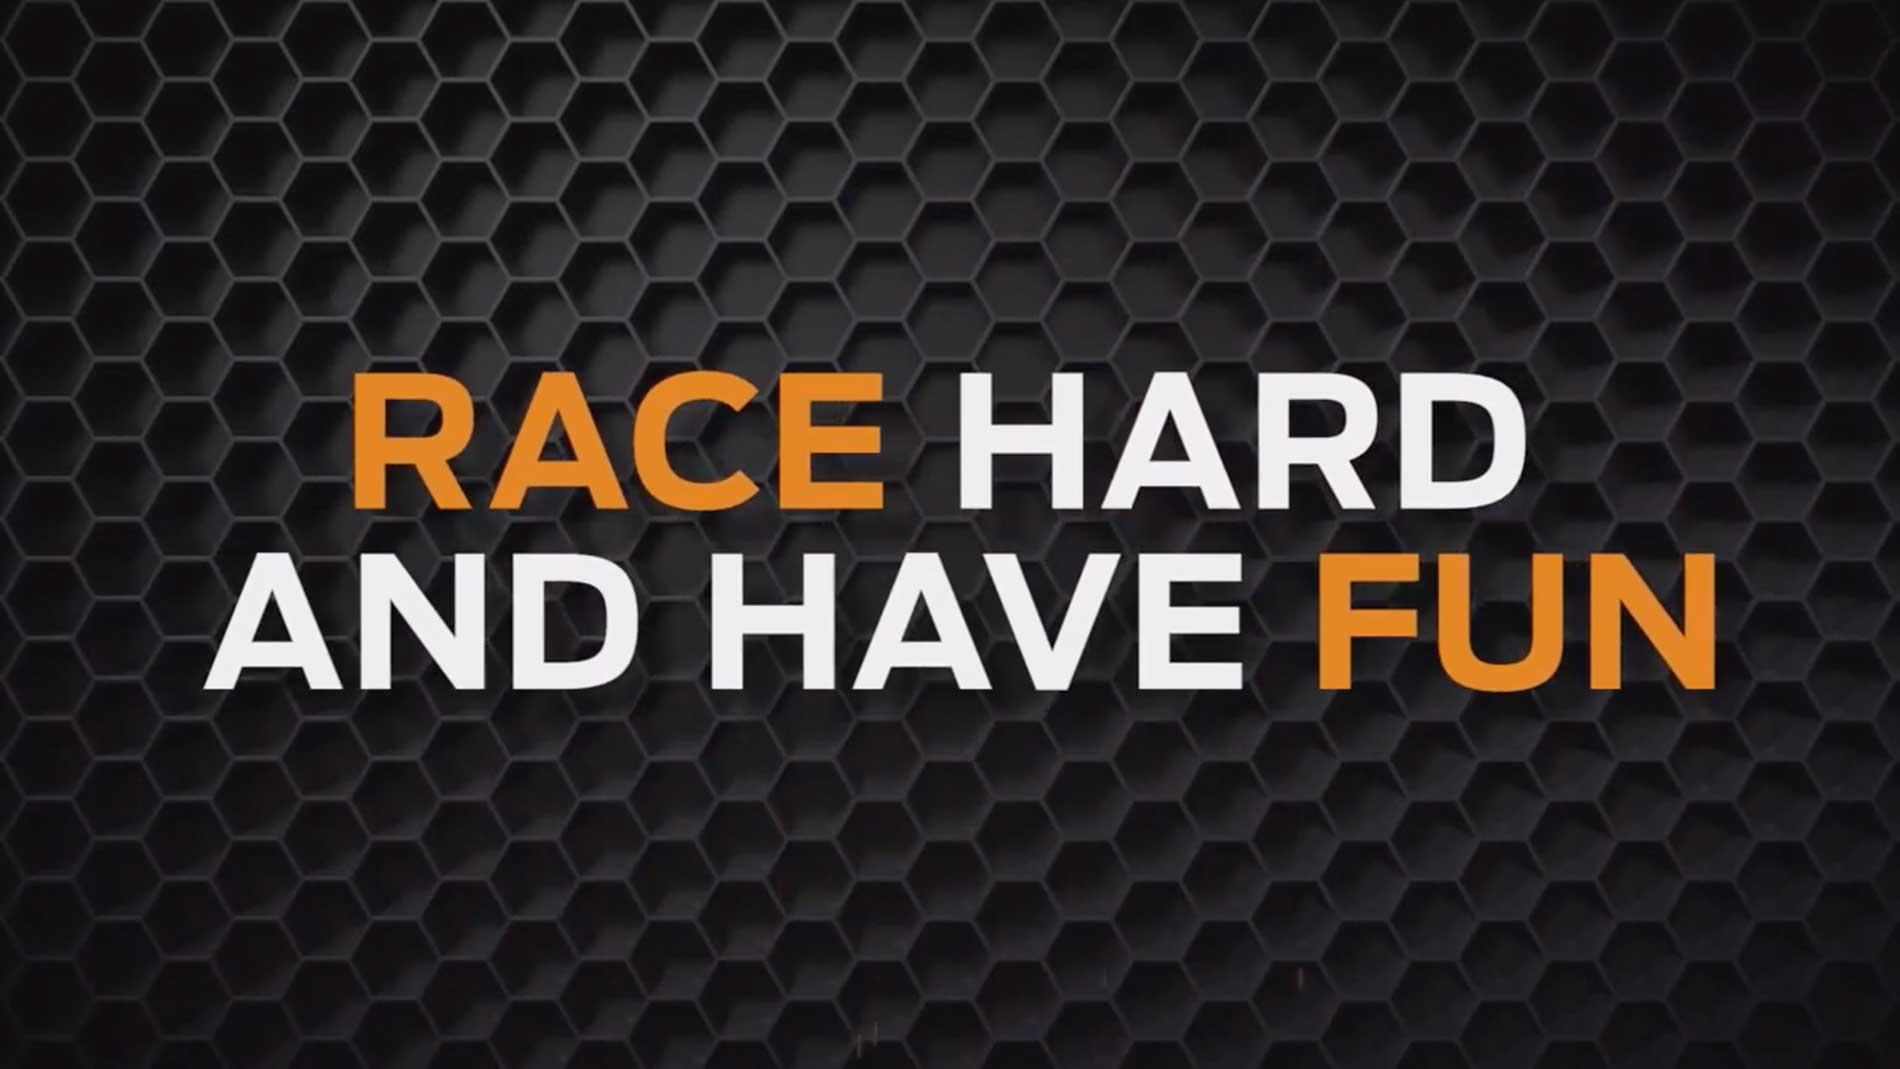 RaceHard babt